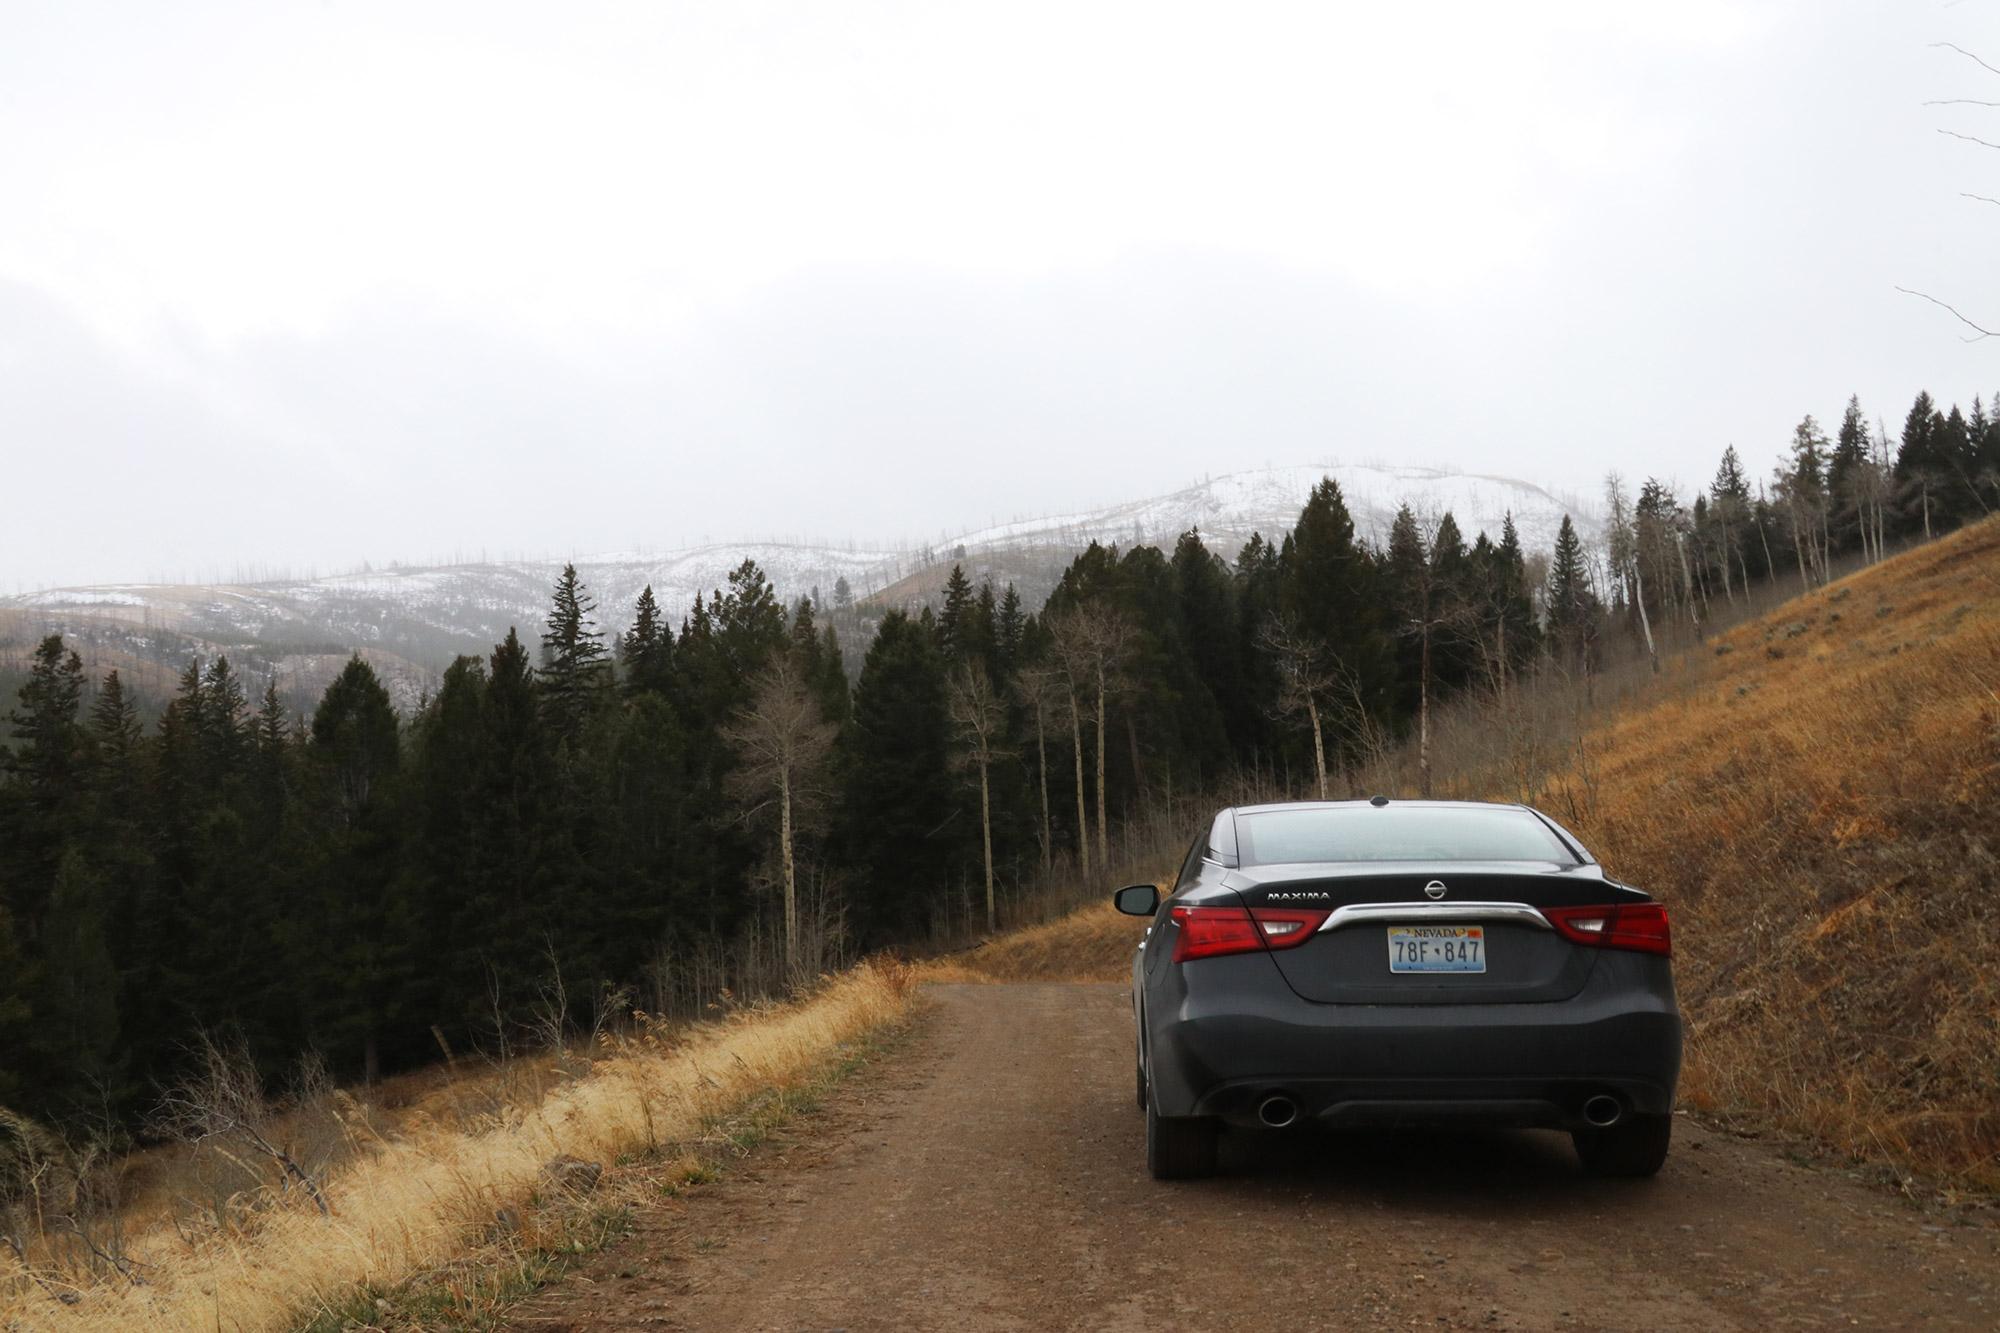 Amerika dag 4 - Yellowstone National Park - Blacktail Plateau Drive